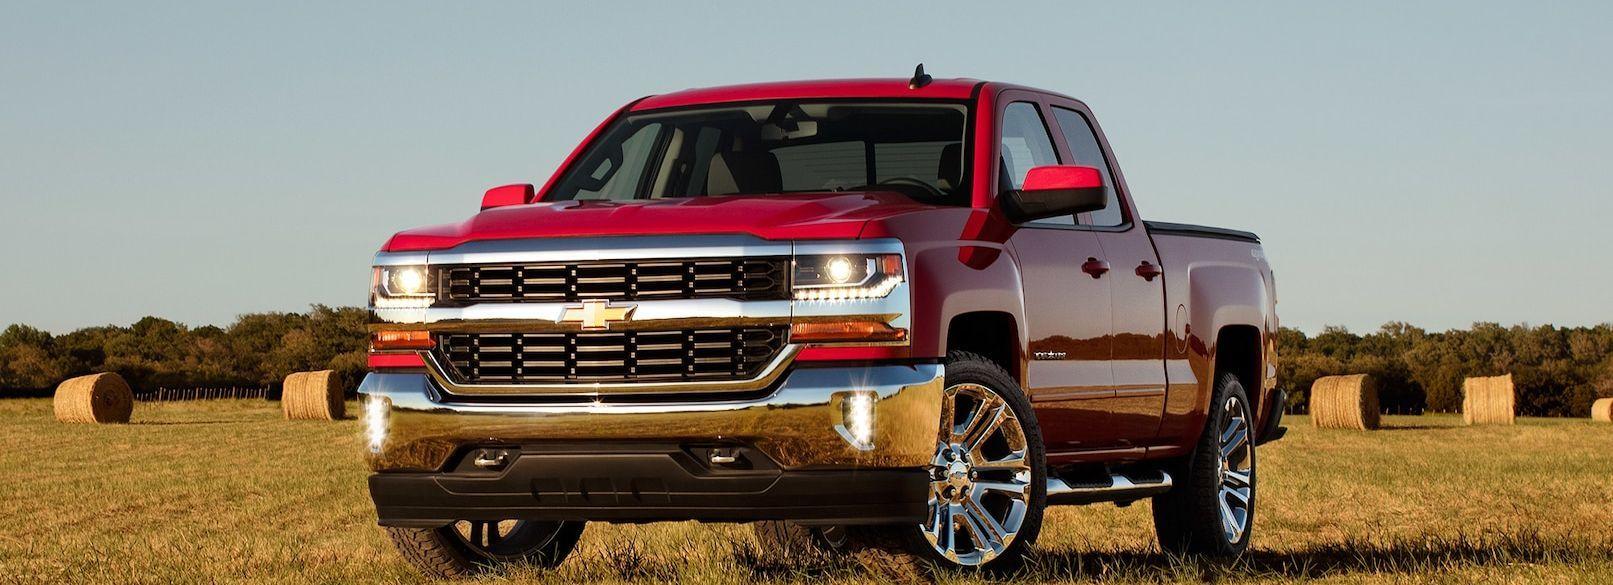 2019 Chevrolet Silverado 1500 Financing near Merrillville, IN